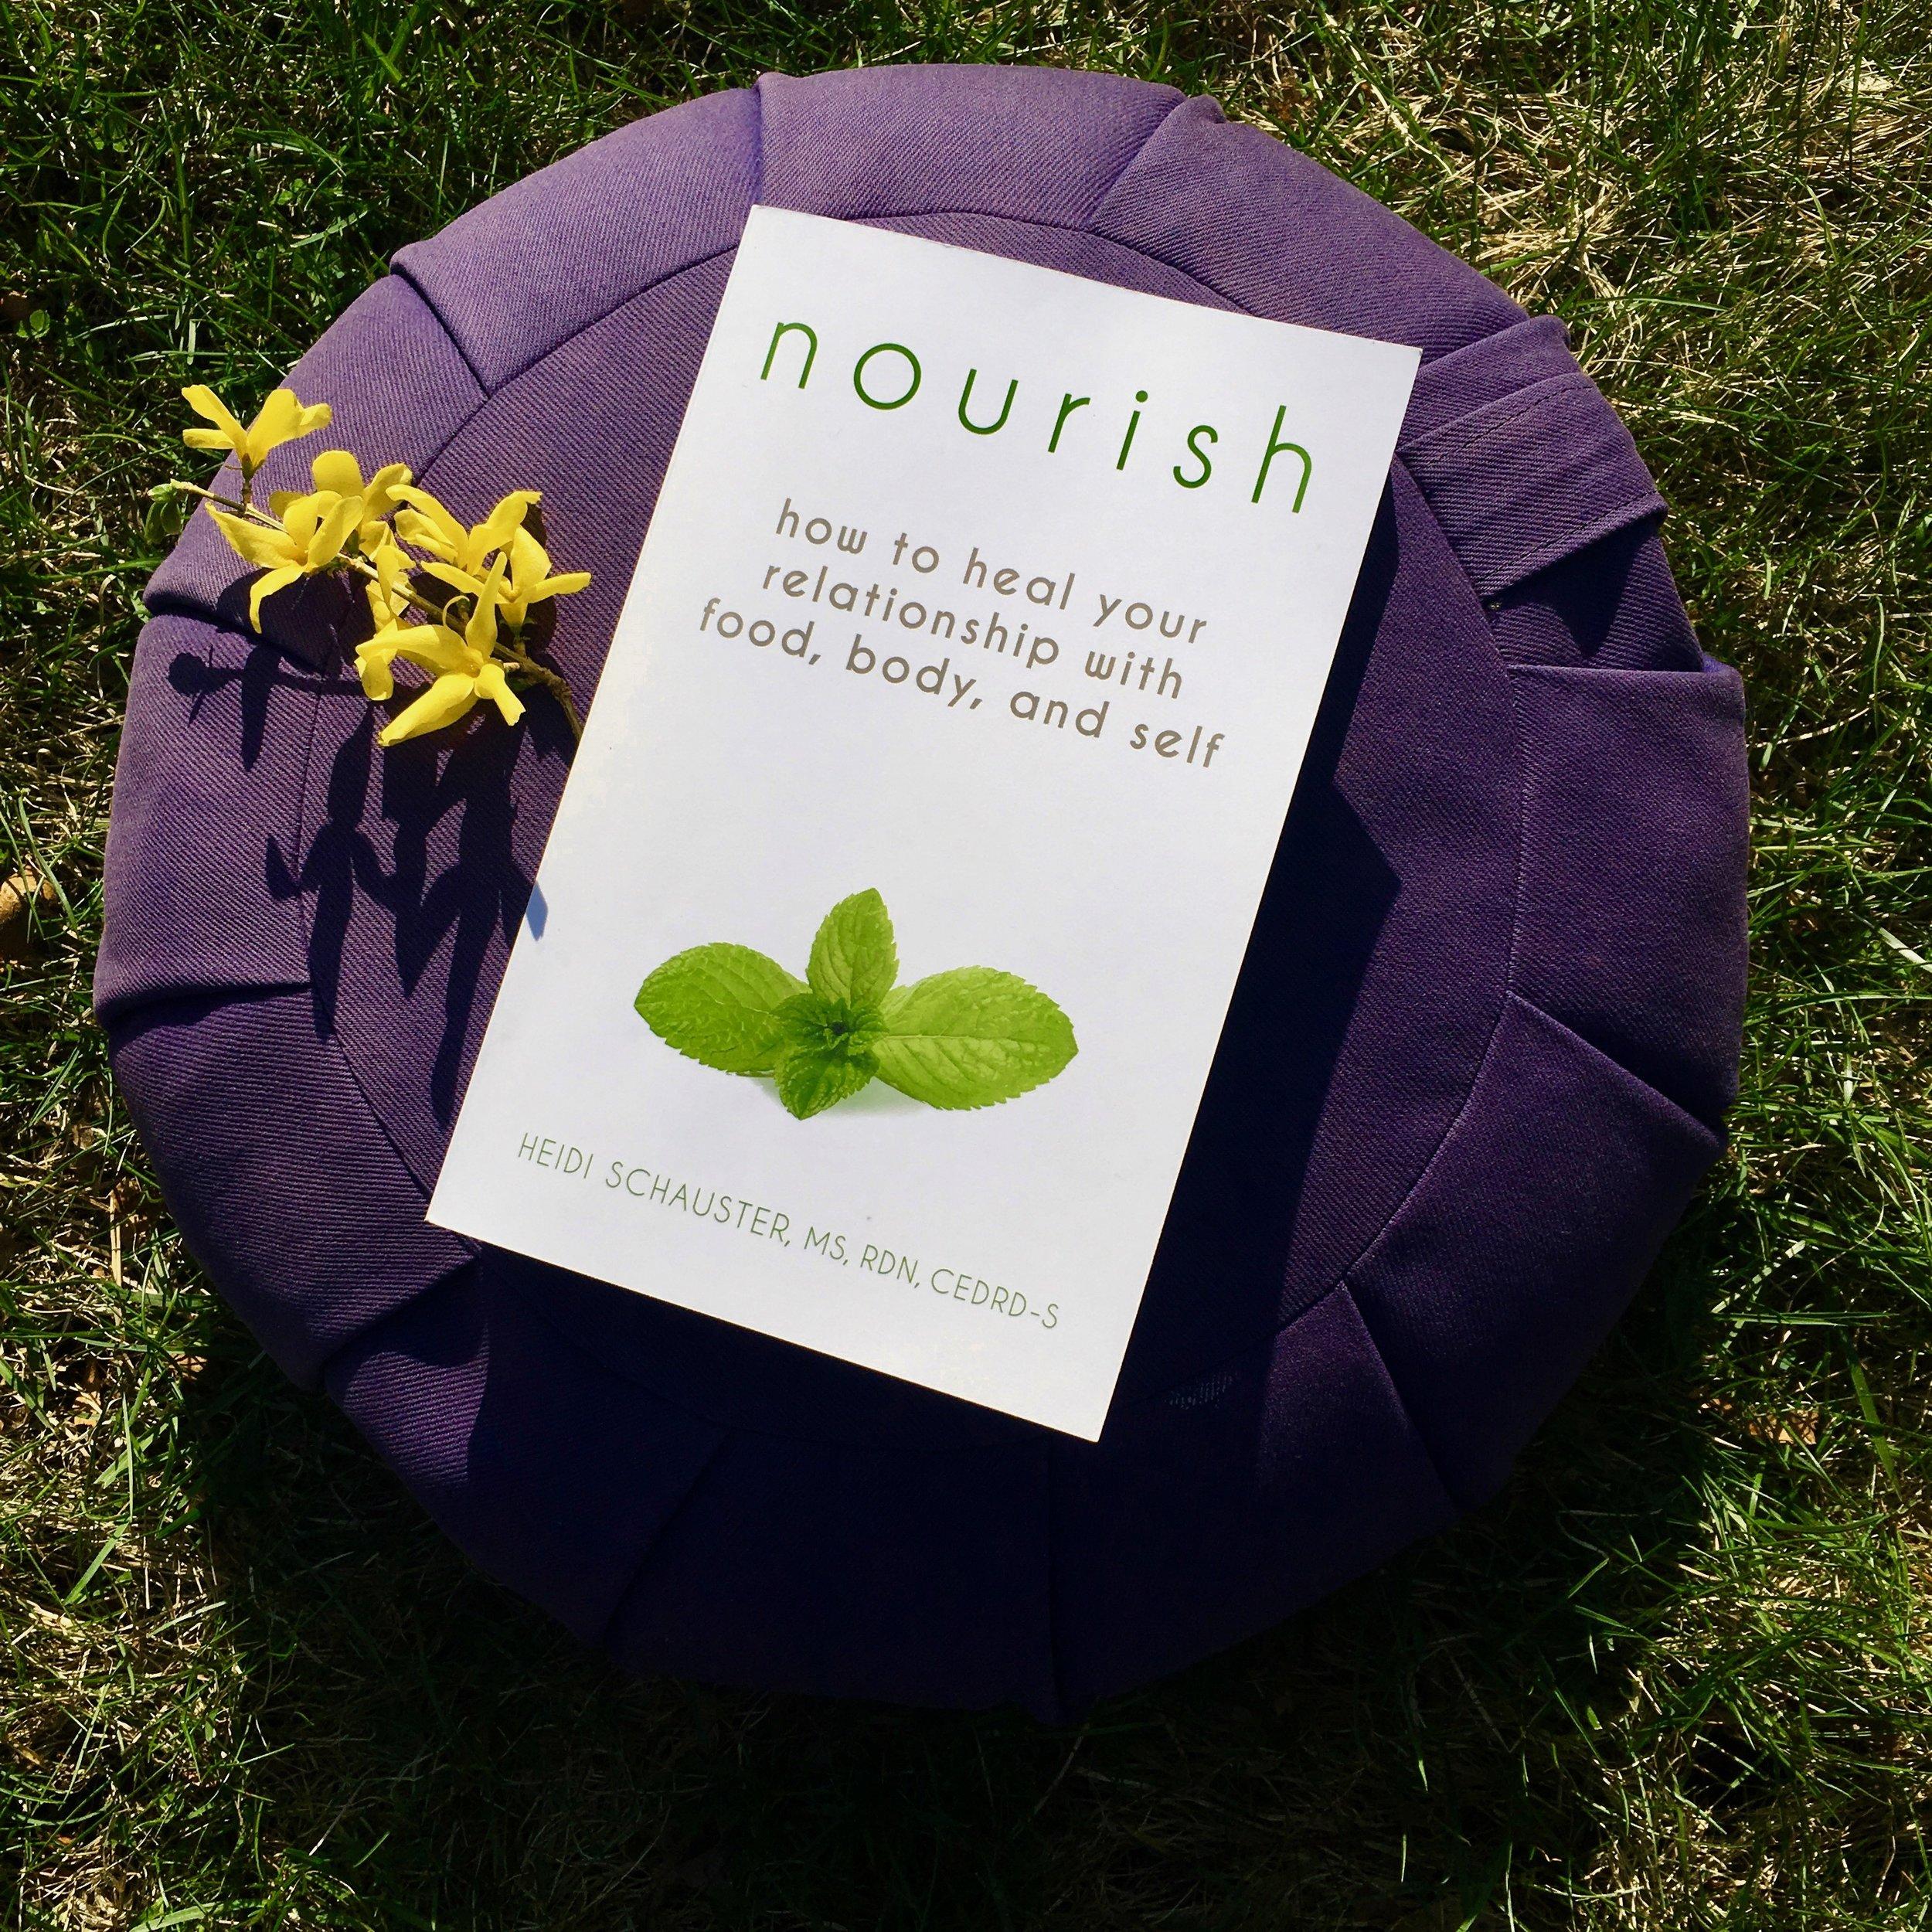 Nourish Book Heidi Schauster